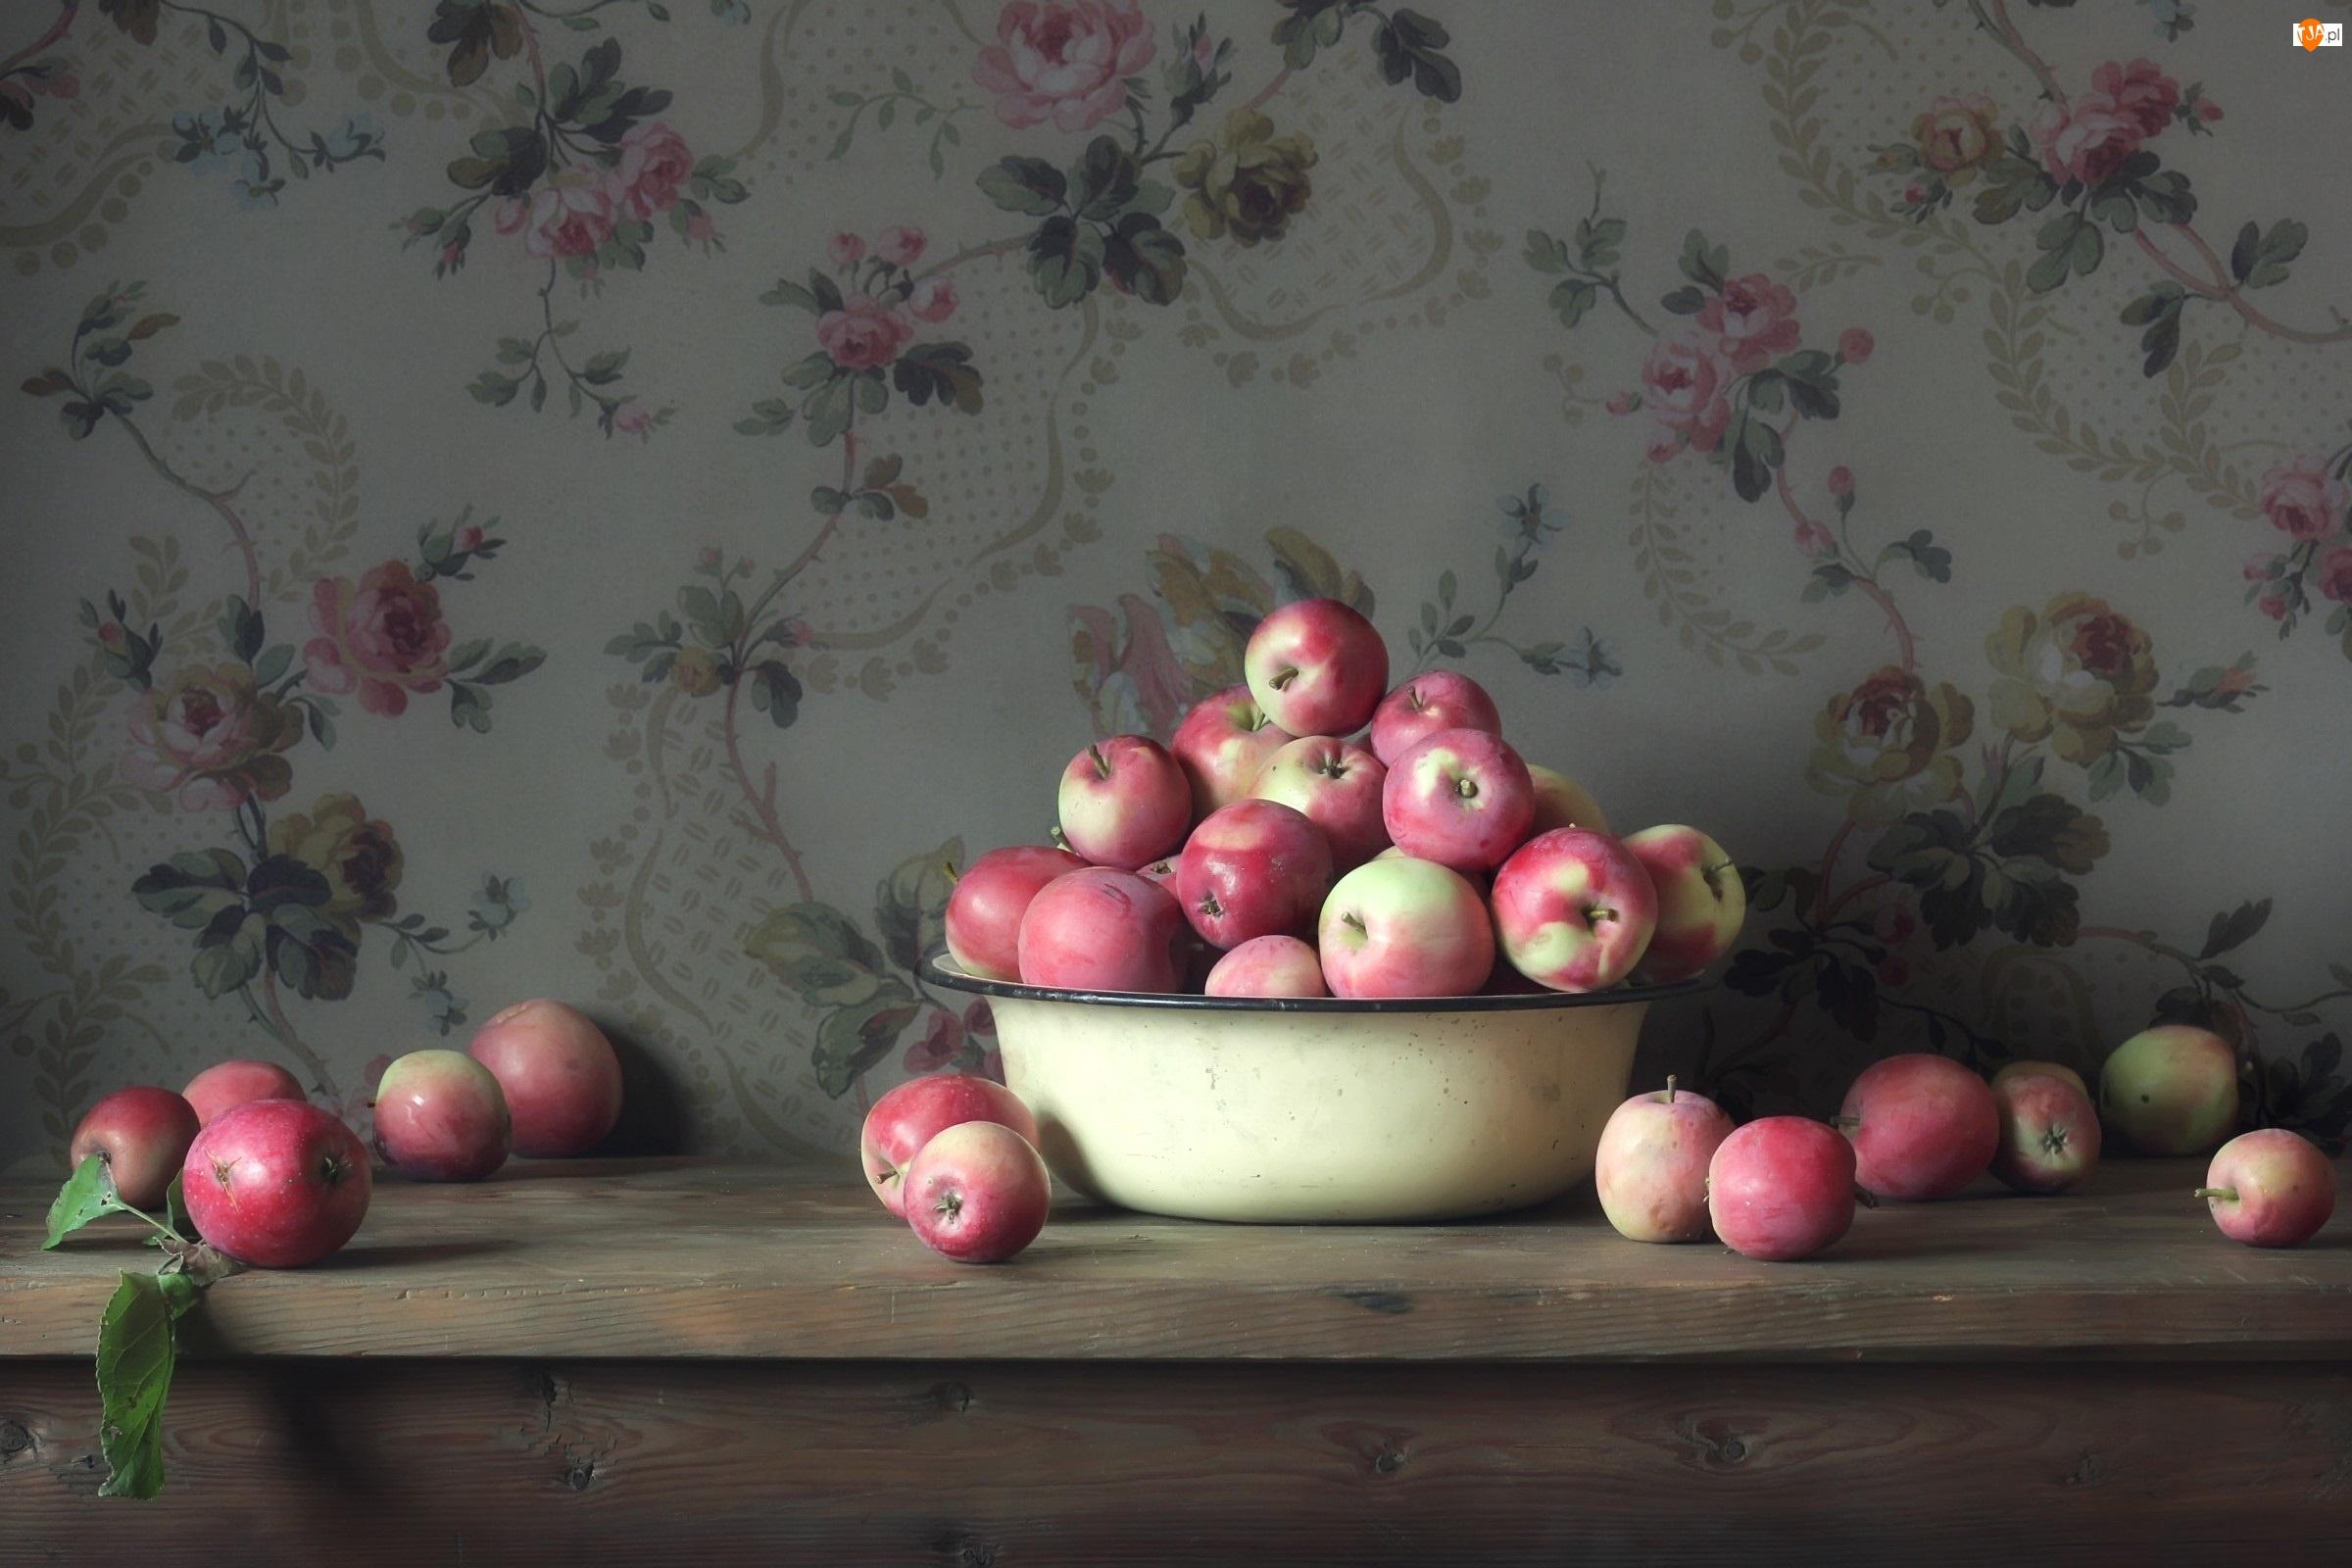 Jablka, Owoce, Miska